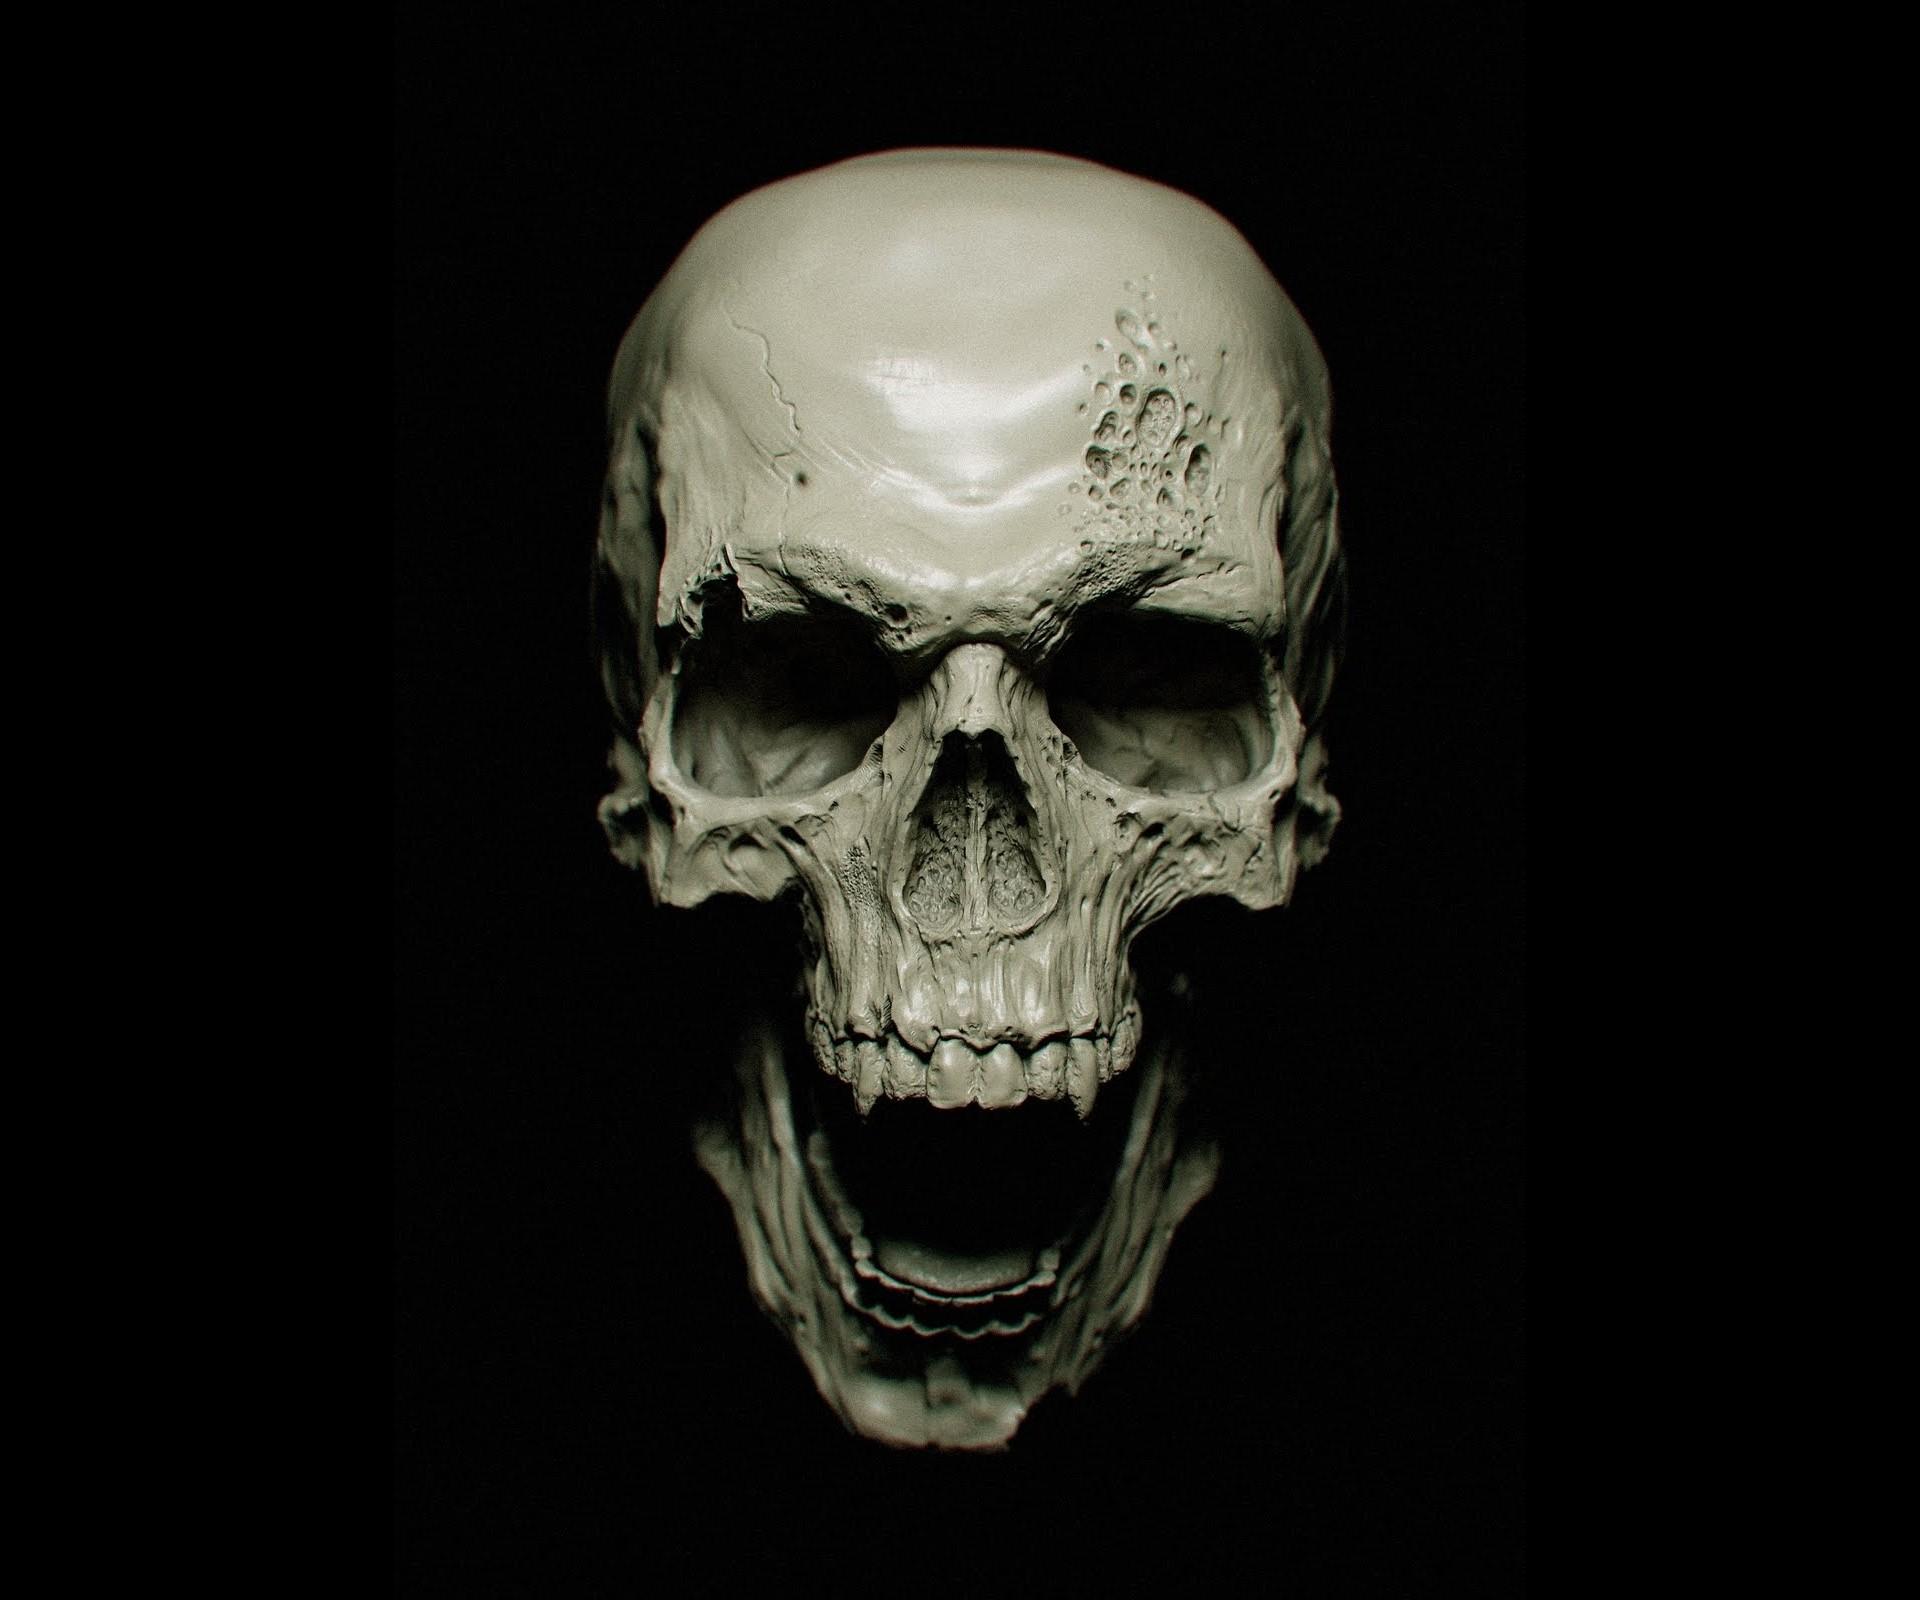 Skull HD Artist 4k Wallpapers Backgrounds